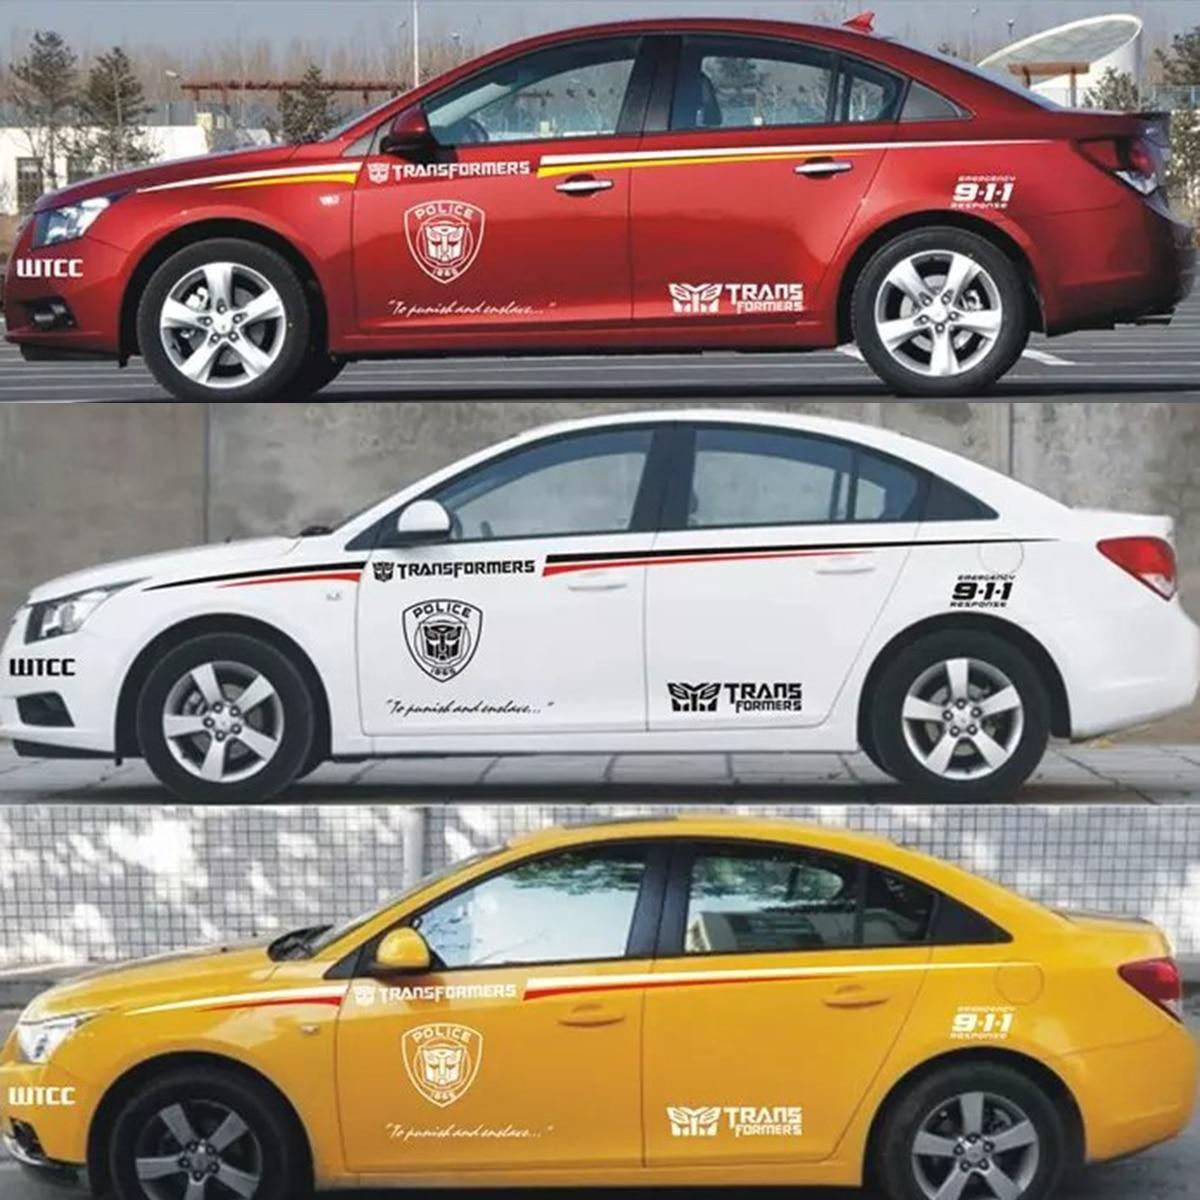 Car sticker design sample - Car Modification Waist Body Paste Modified Us Version 911 Police Transformers Hornet Waist Body Garland Decorative